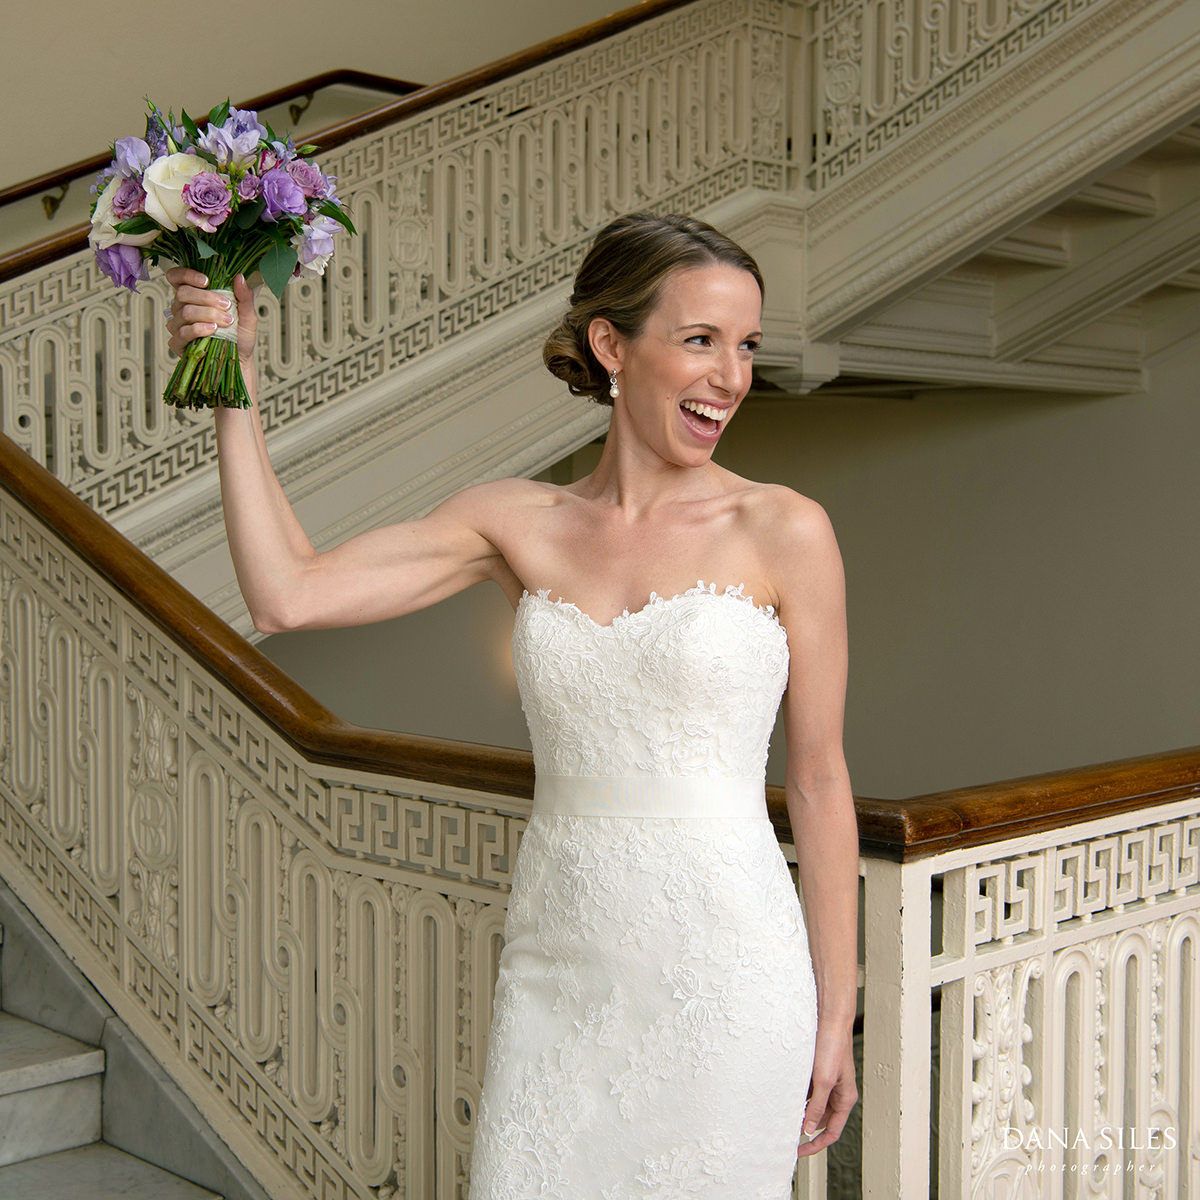 boston-bride-pronovias-gown-boston-bridal-bouquet-Flou(-e)r